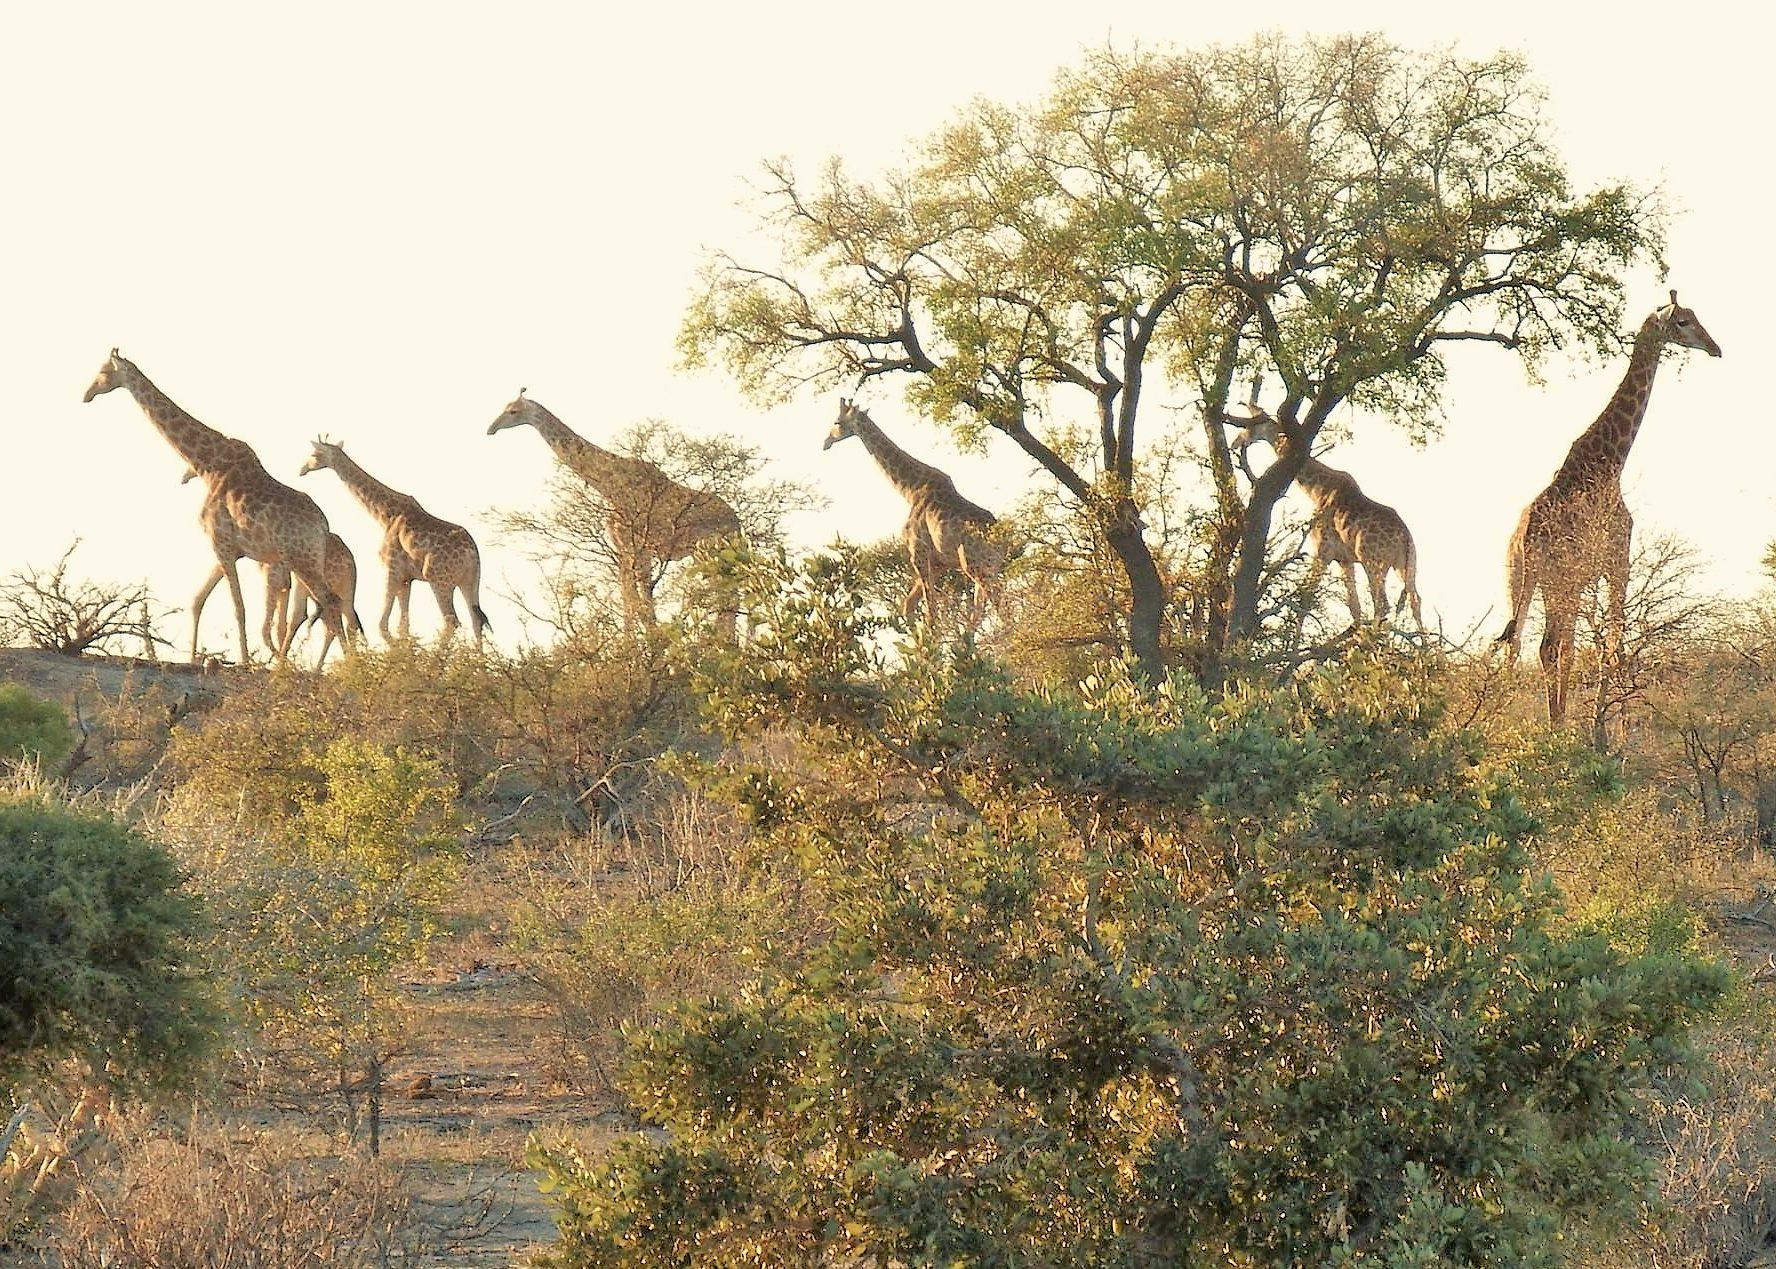 Giraffe processing along the horizon at nDzuti